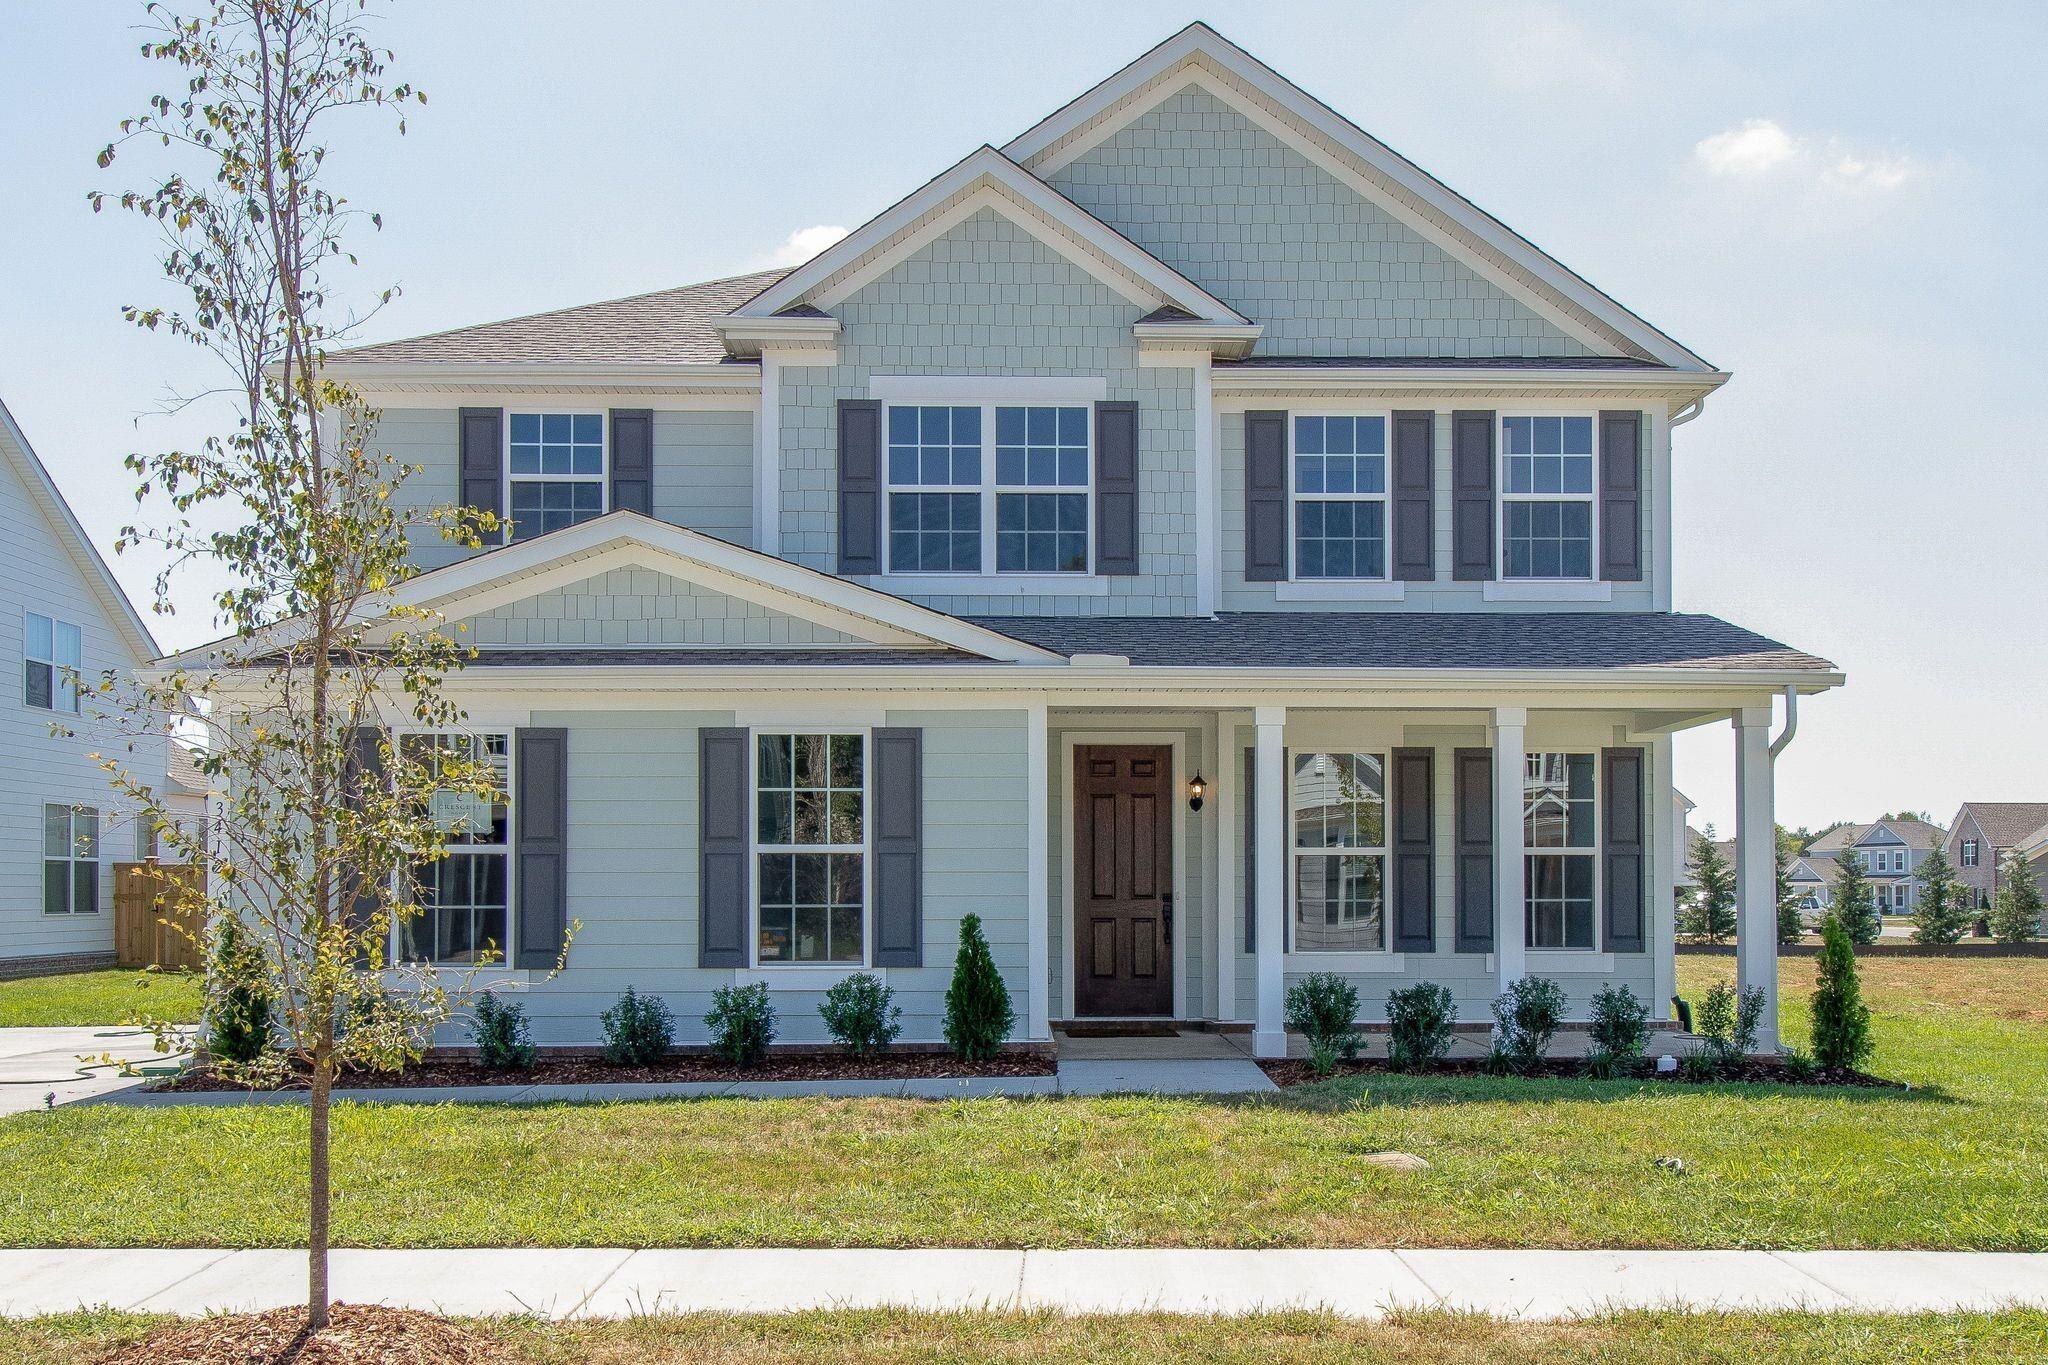 3412 Chinoe Dr, Murfreesboro, TN 37129 - Murfreesboro, TN real estate listing